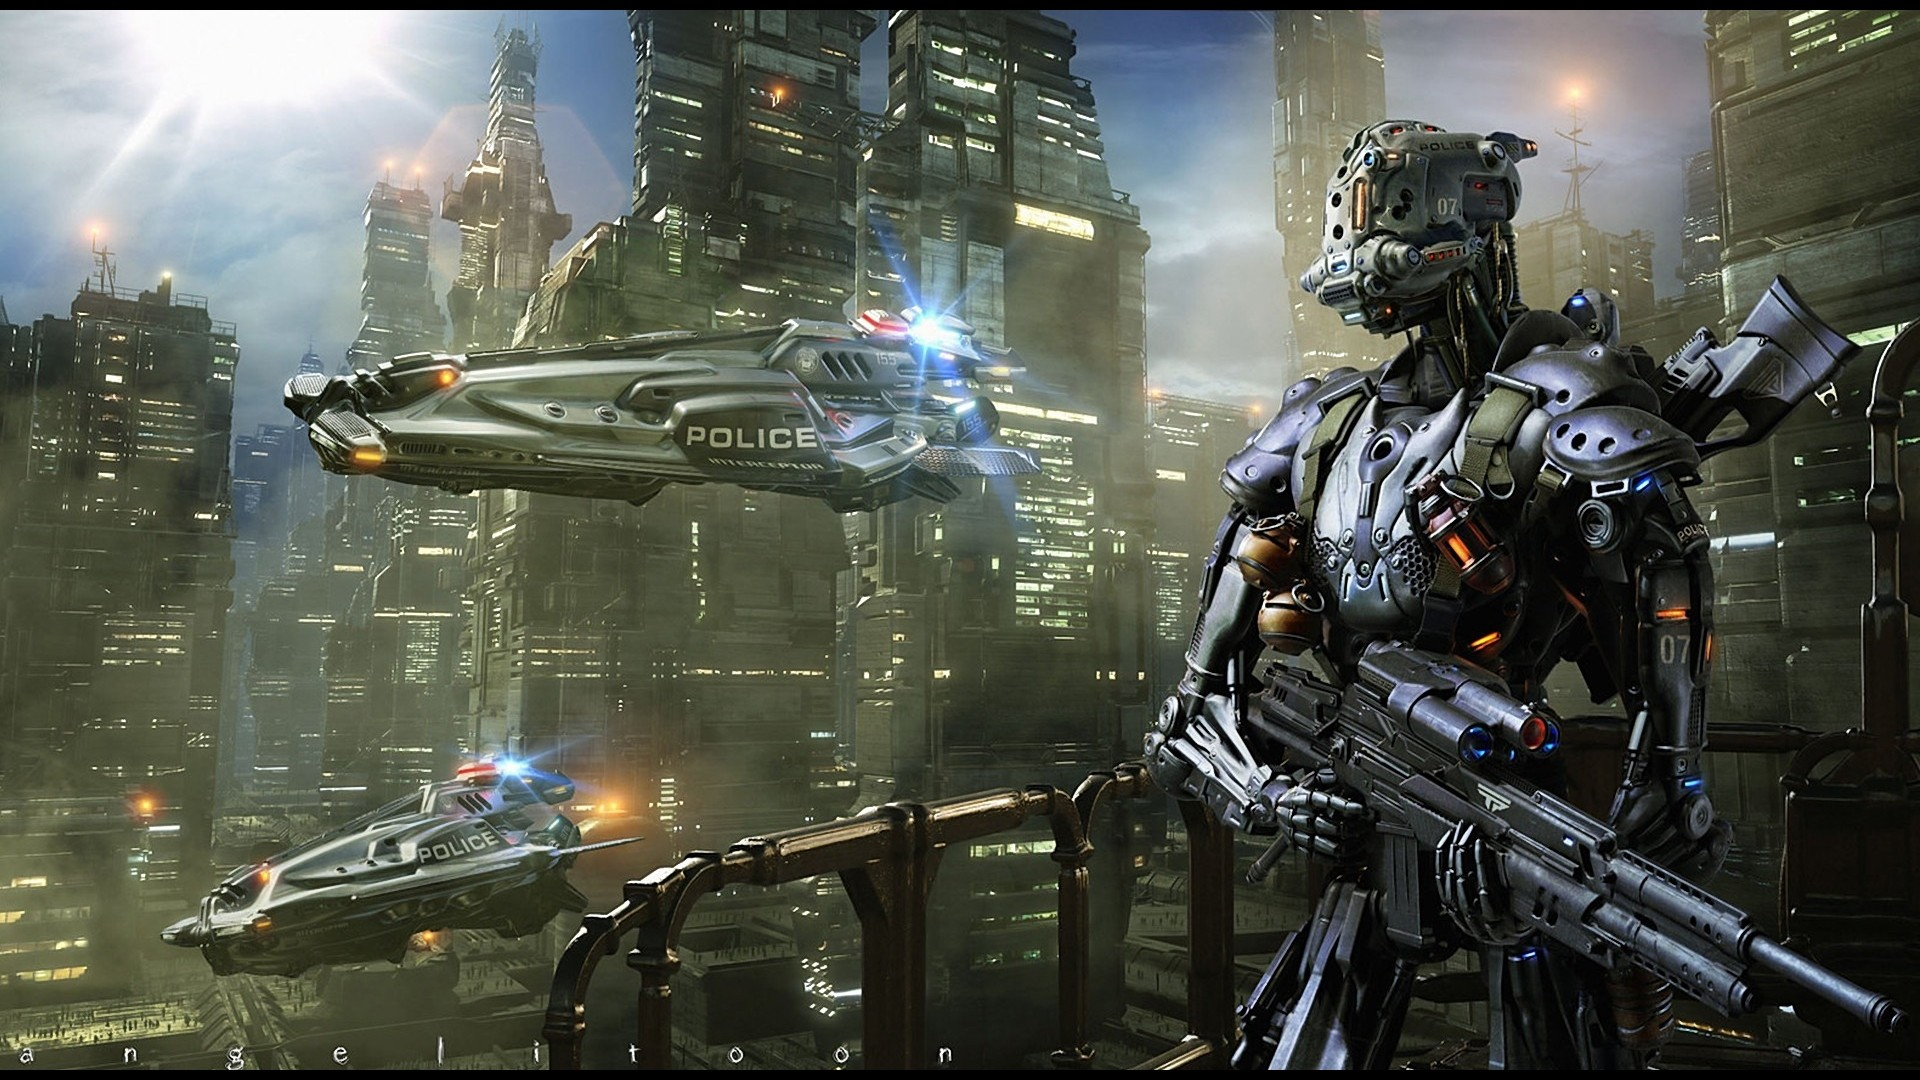 Free Sci Fi Fantasy Desktop Wallpaper: 47+ Sci Fi Wallpapers ·① Download Free Stunning Full HD